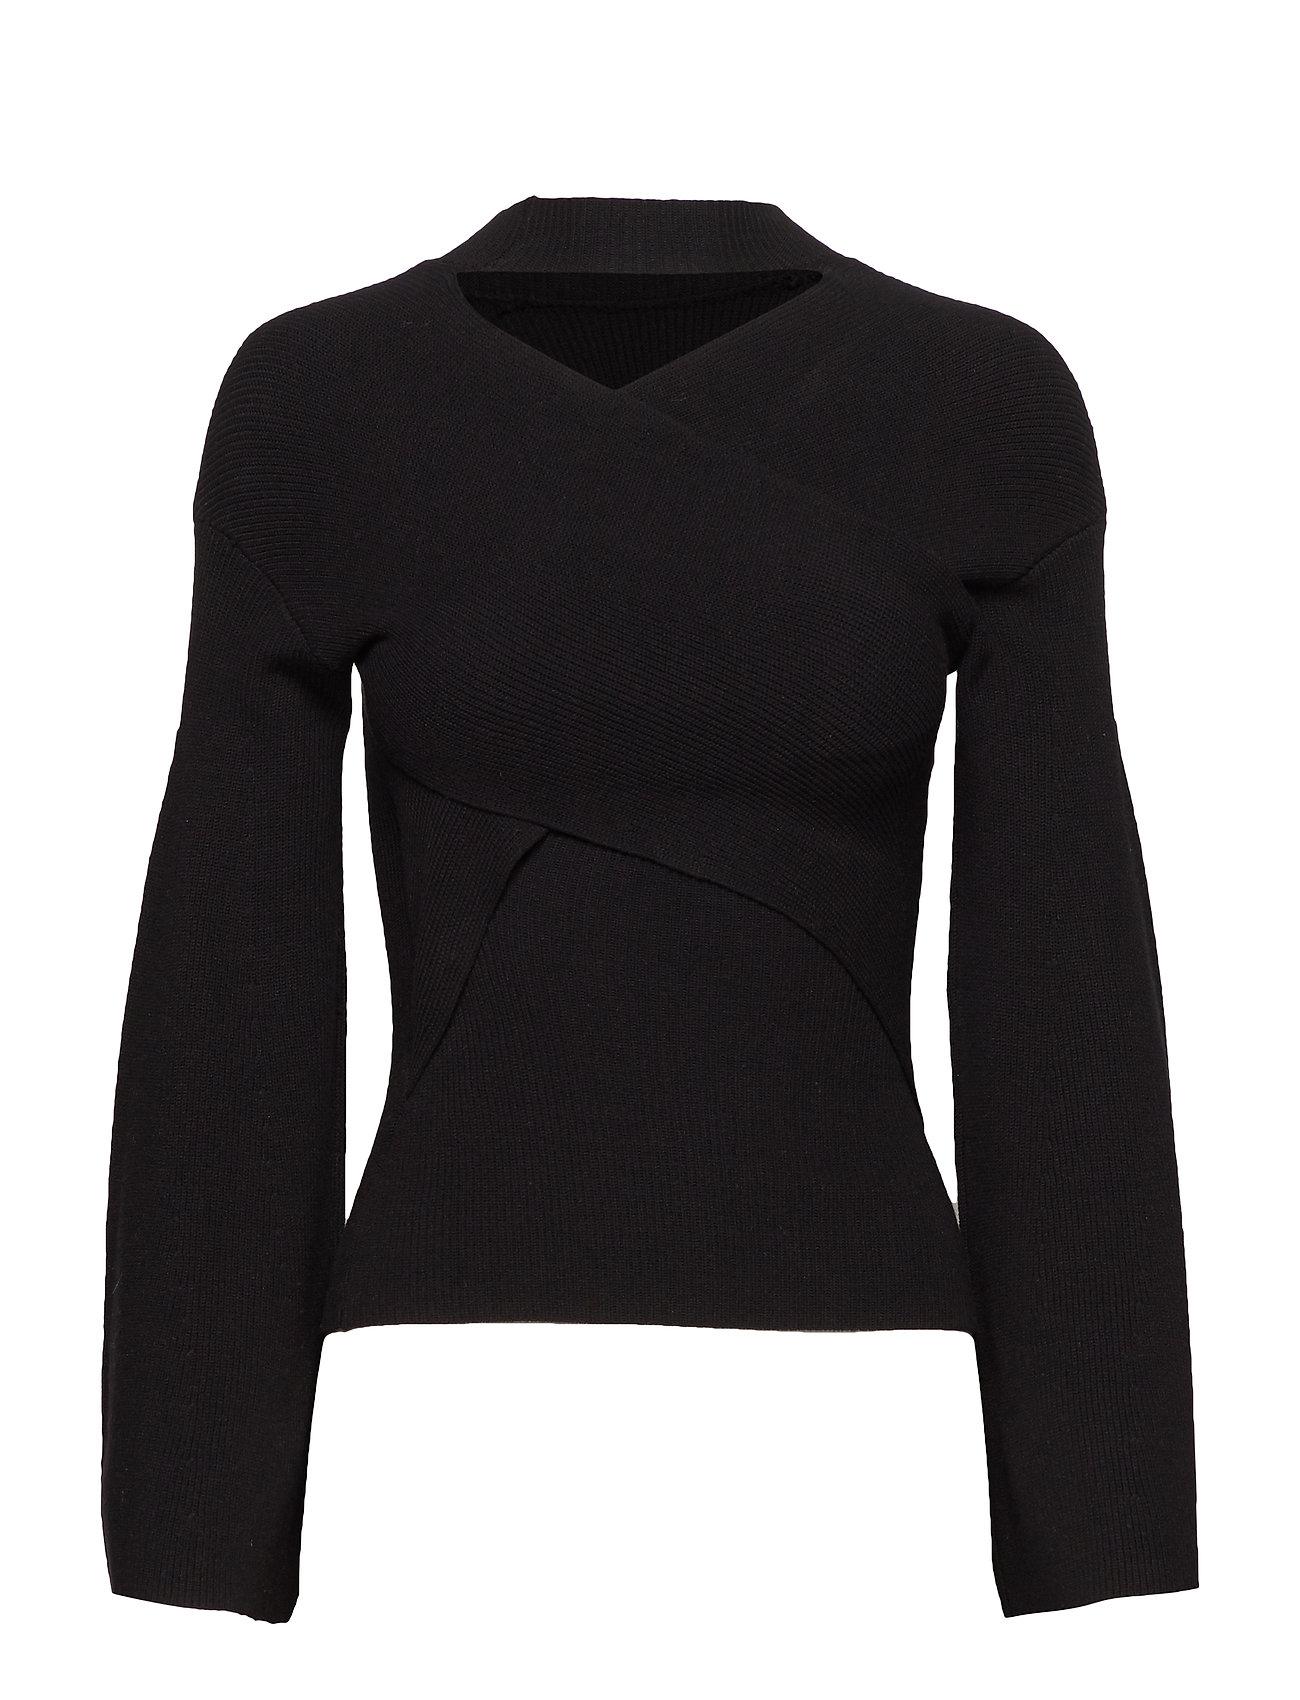 A996Marciano Guess Topjet Sabrina Sweater Black By VqMpSzU